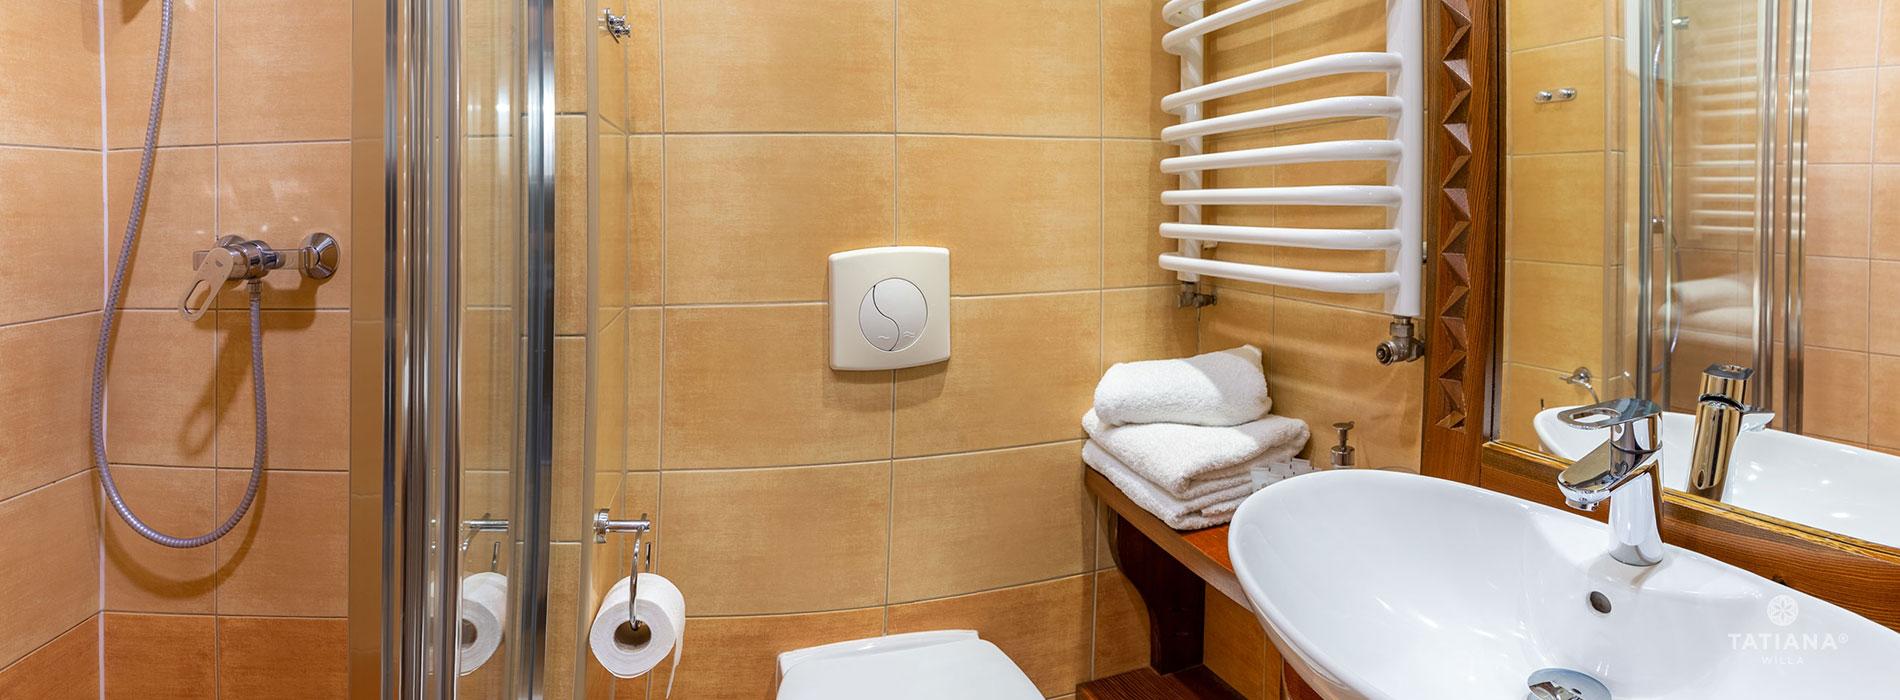 Apartament Premium 2- łazienka